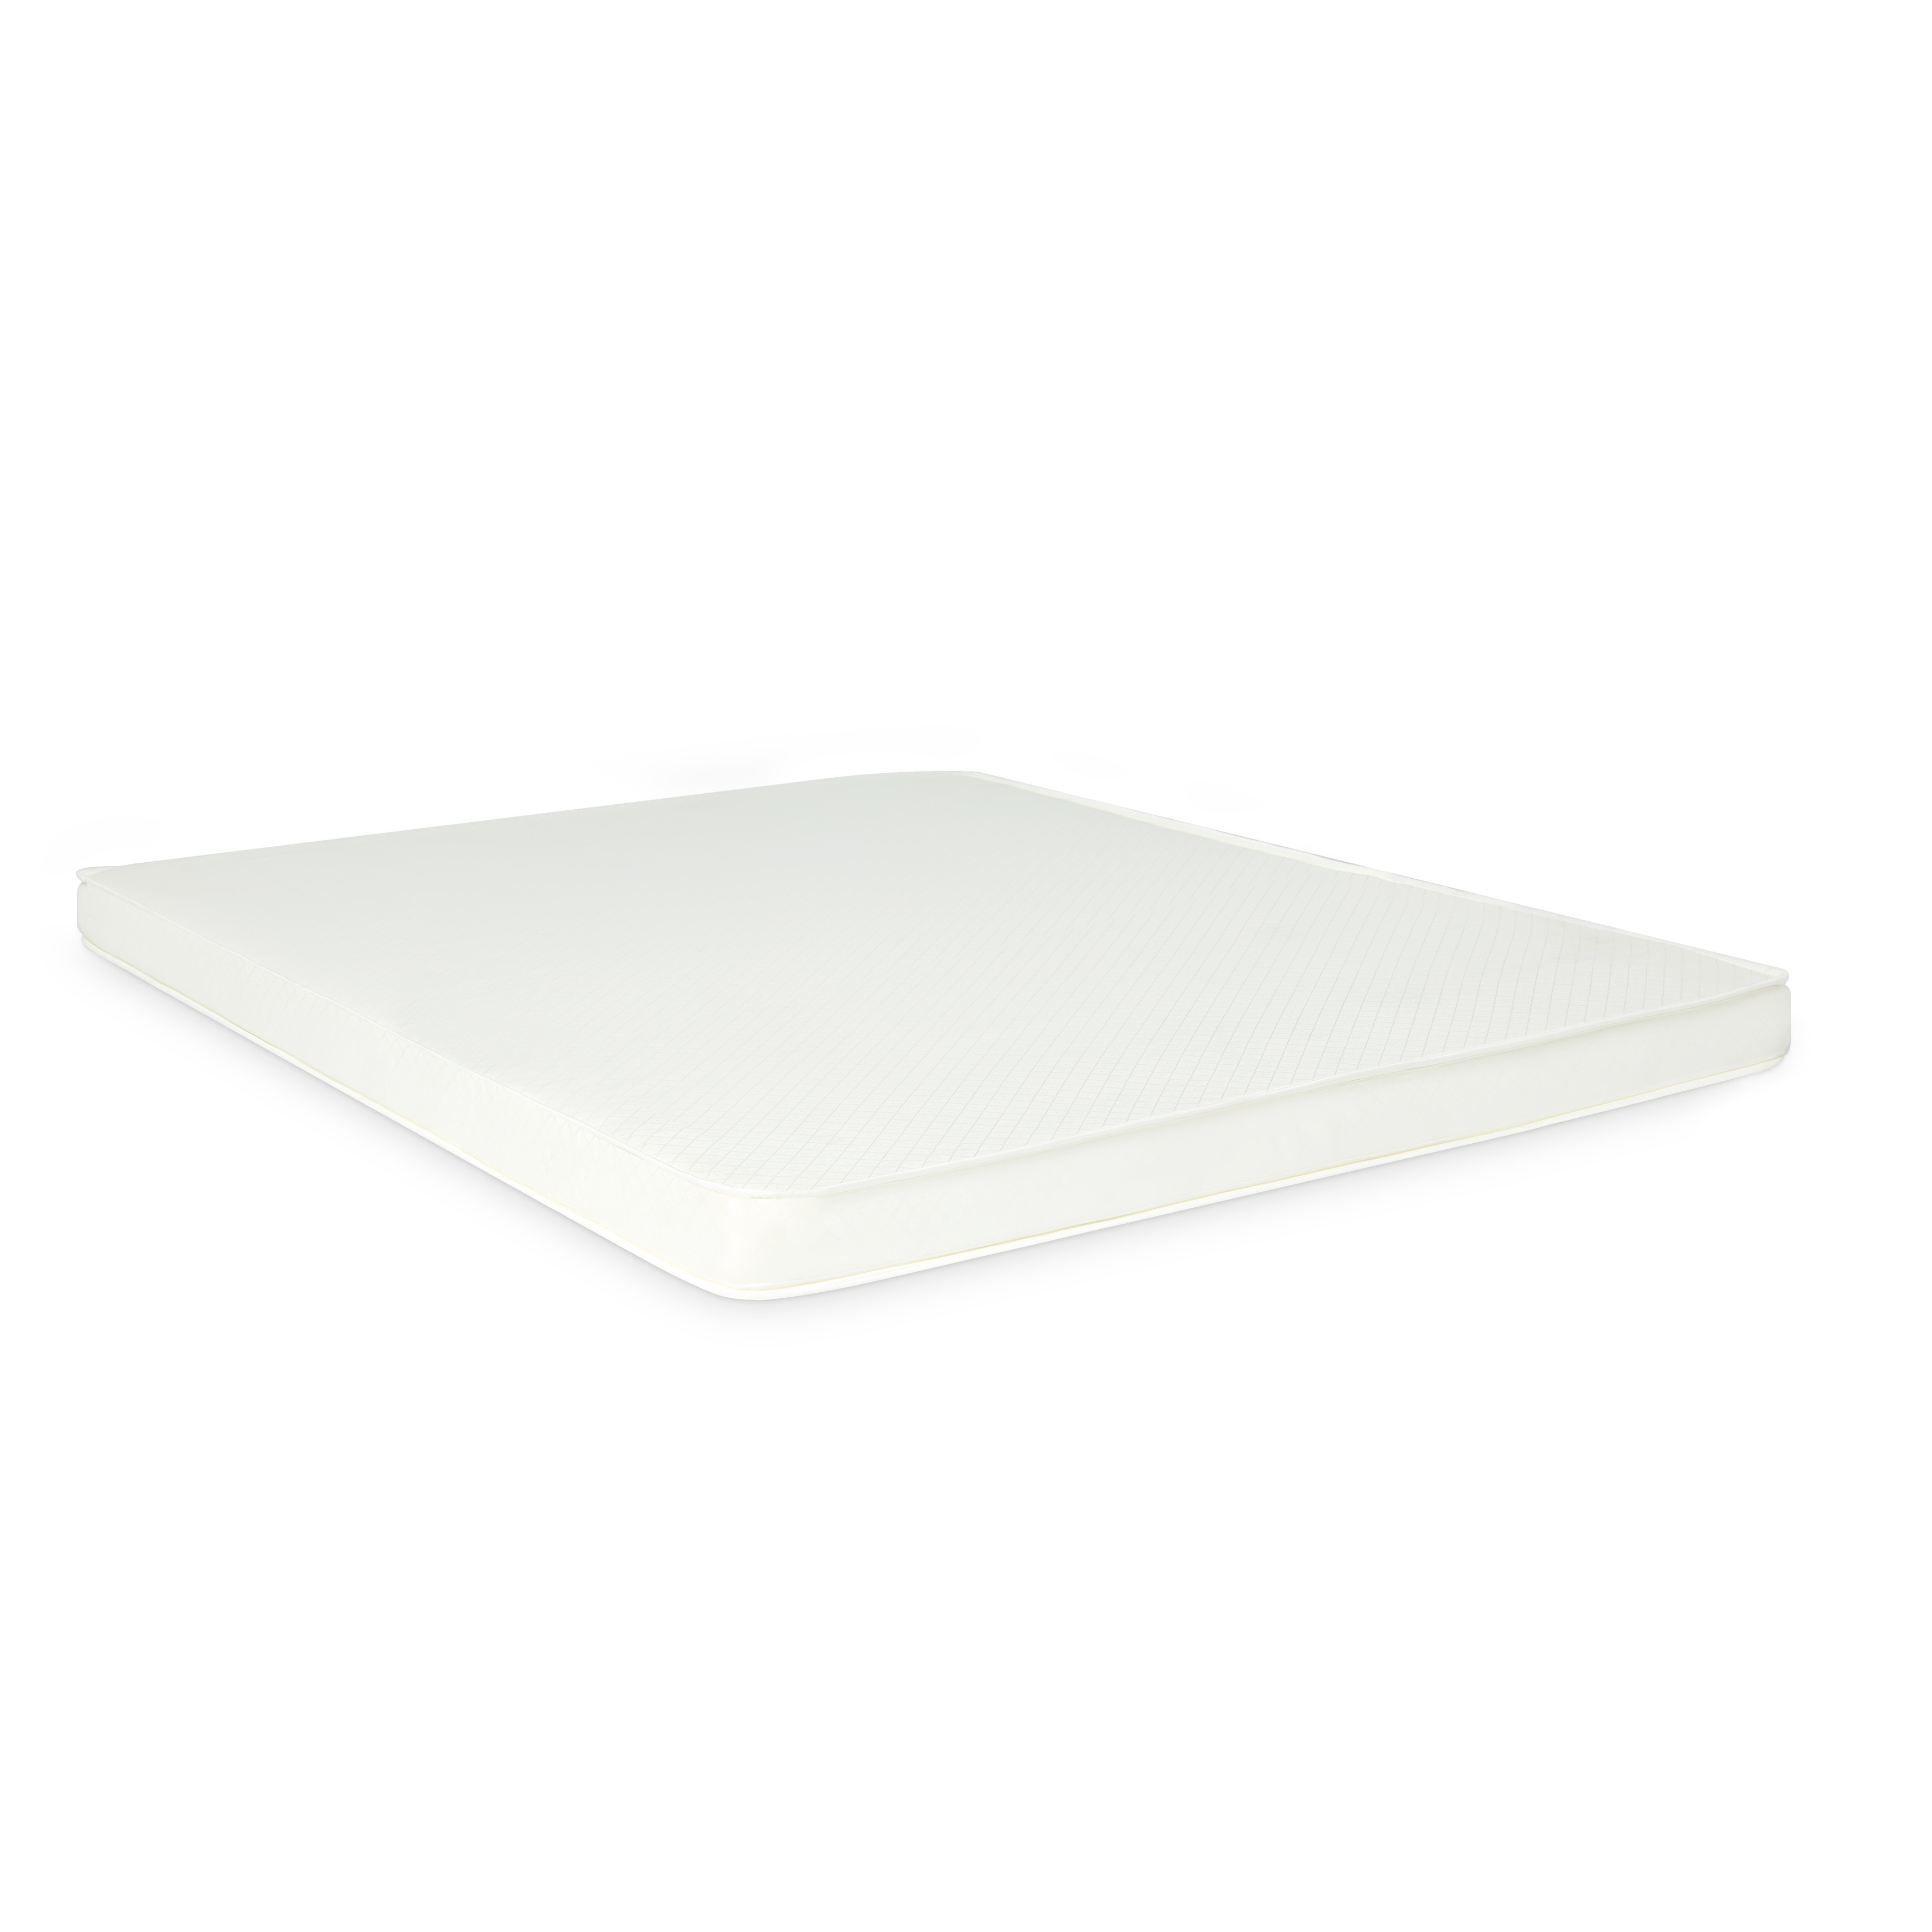 Select Luxury Flippable 4 Inch Full Size Foam Sofa Sleeper